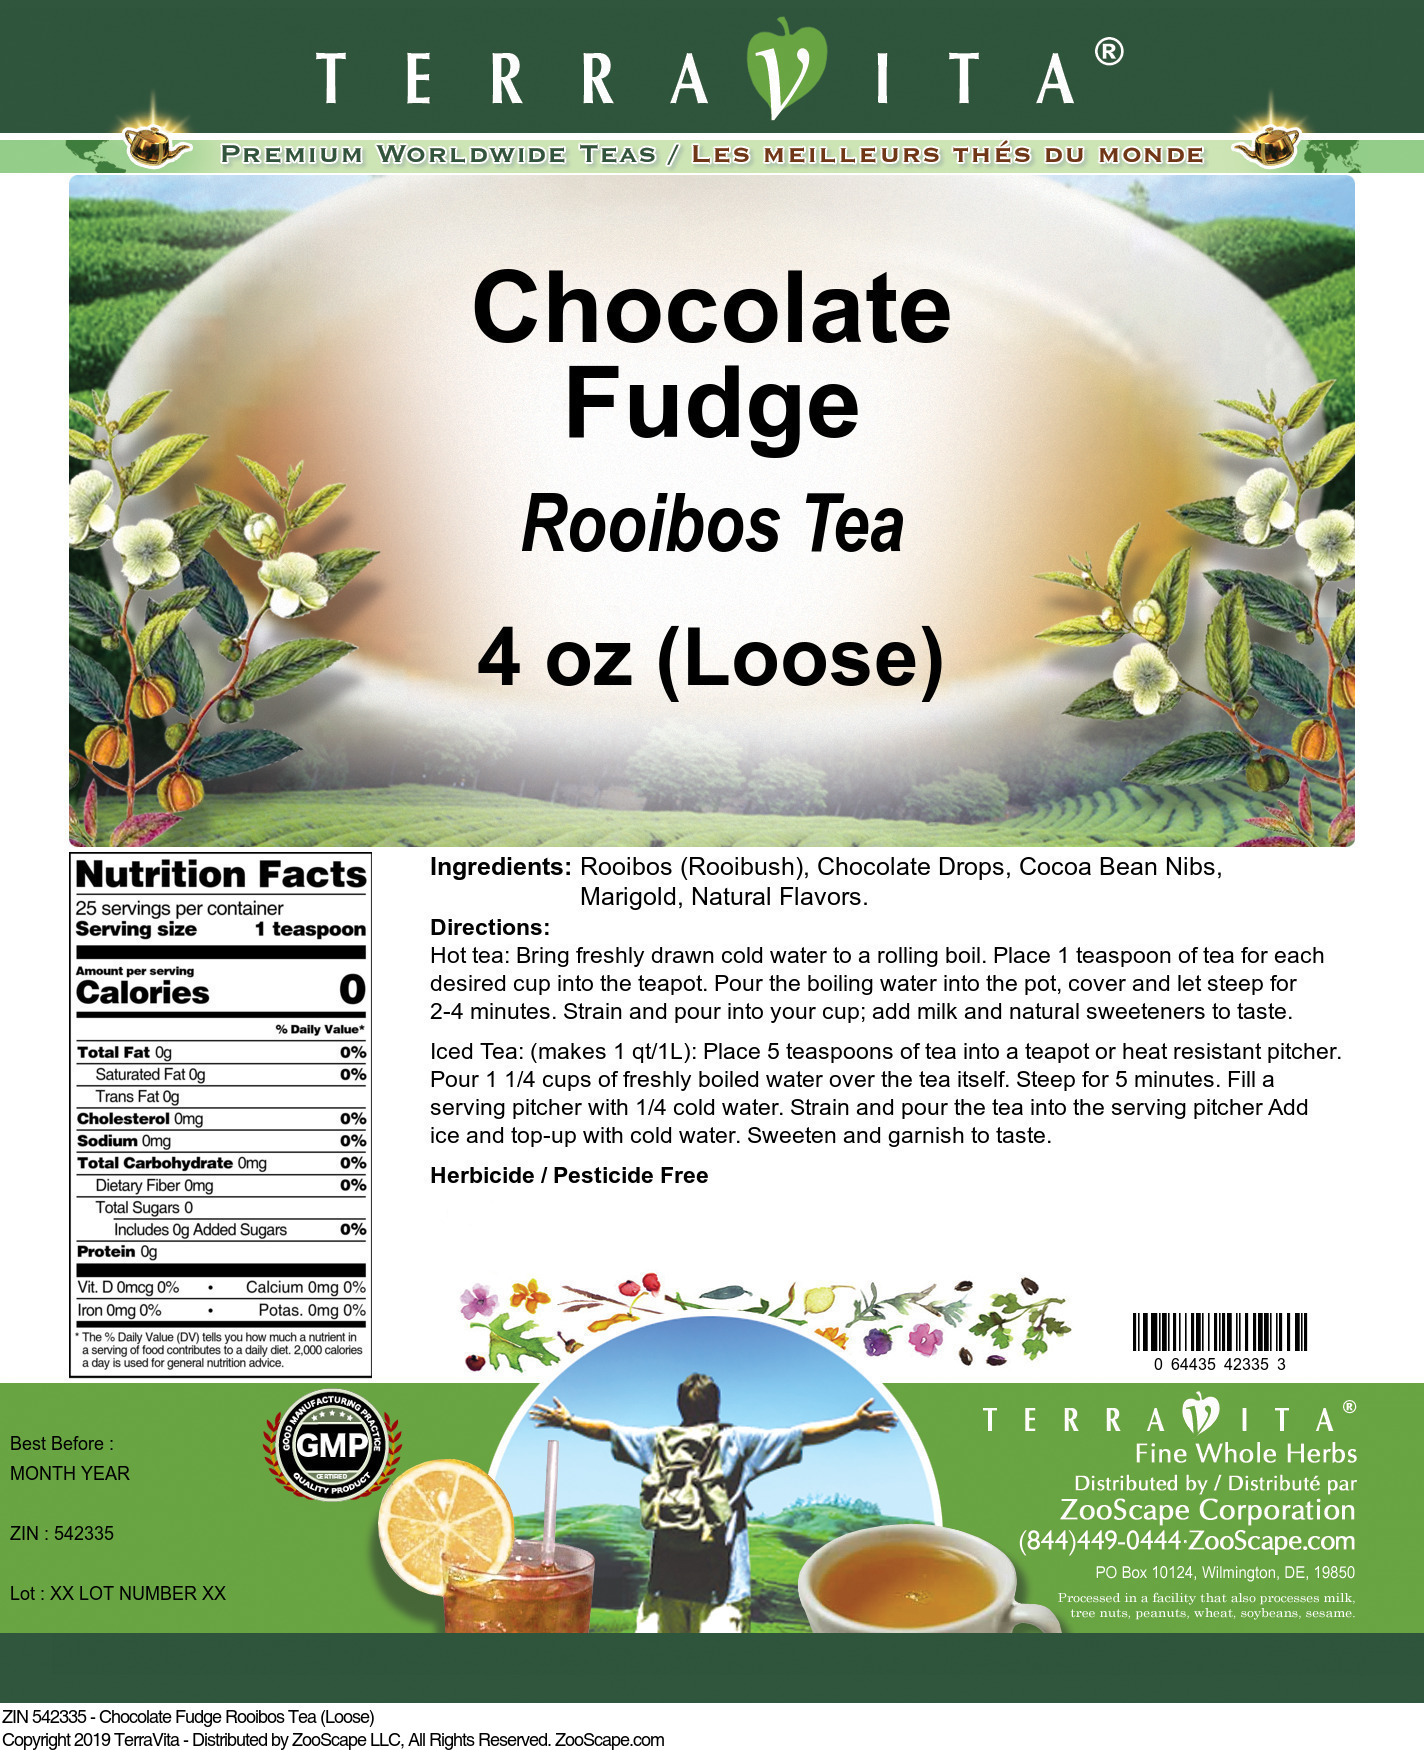 Chocolate Fudge Rooibos Tea